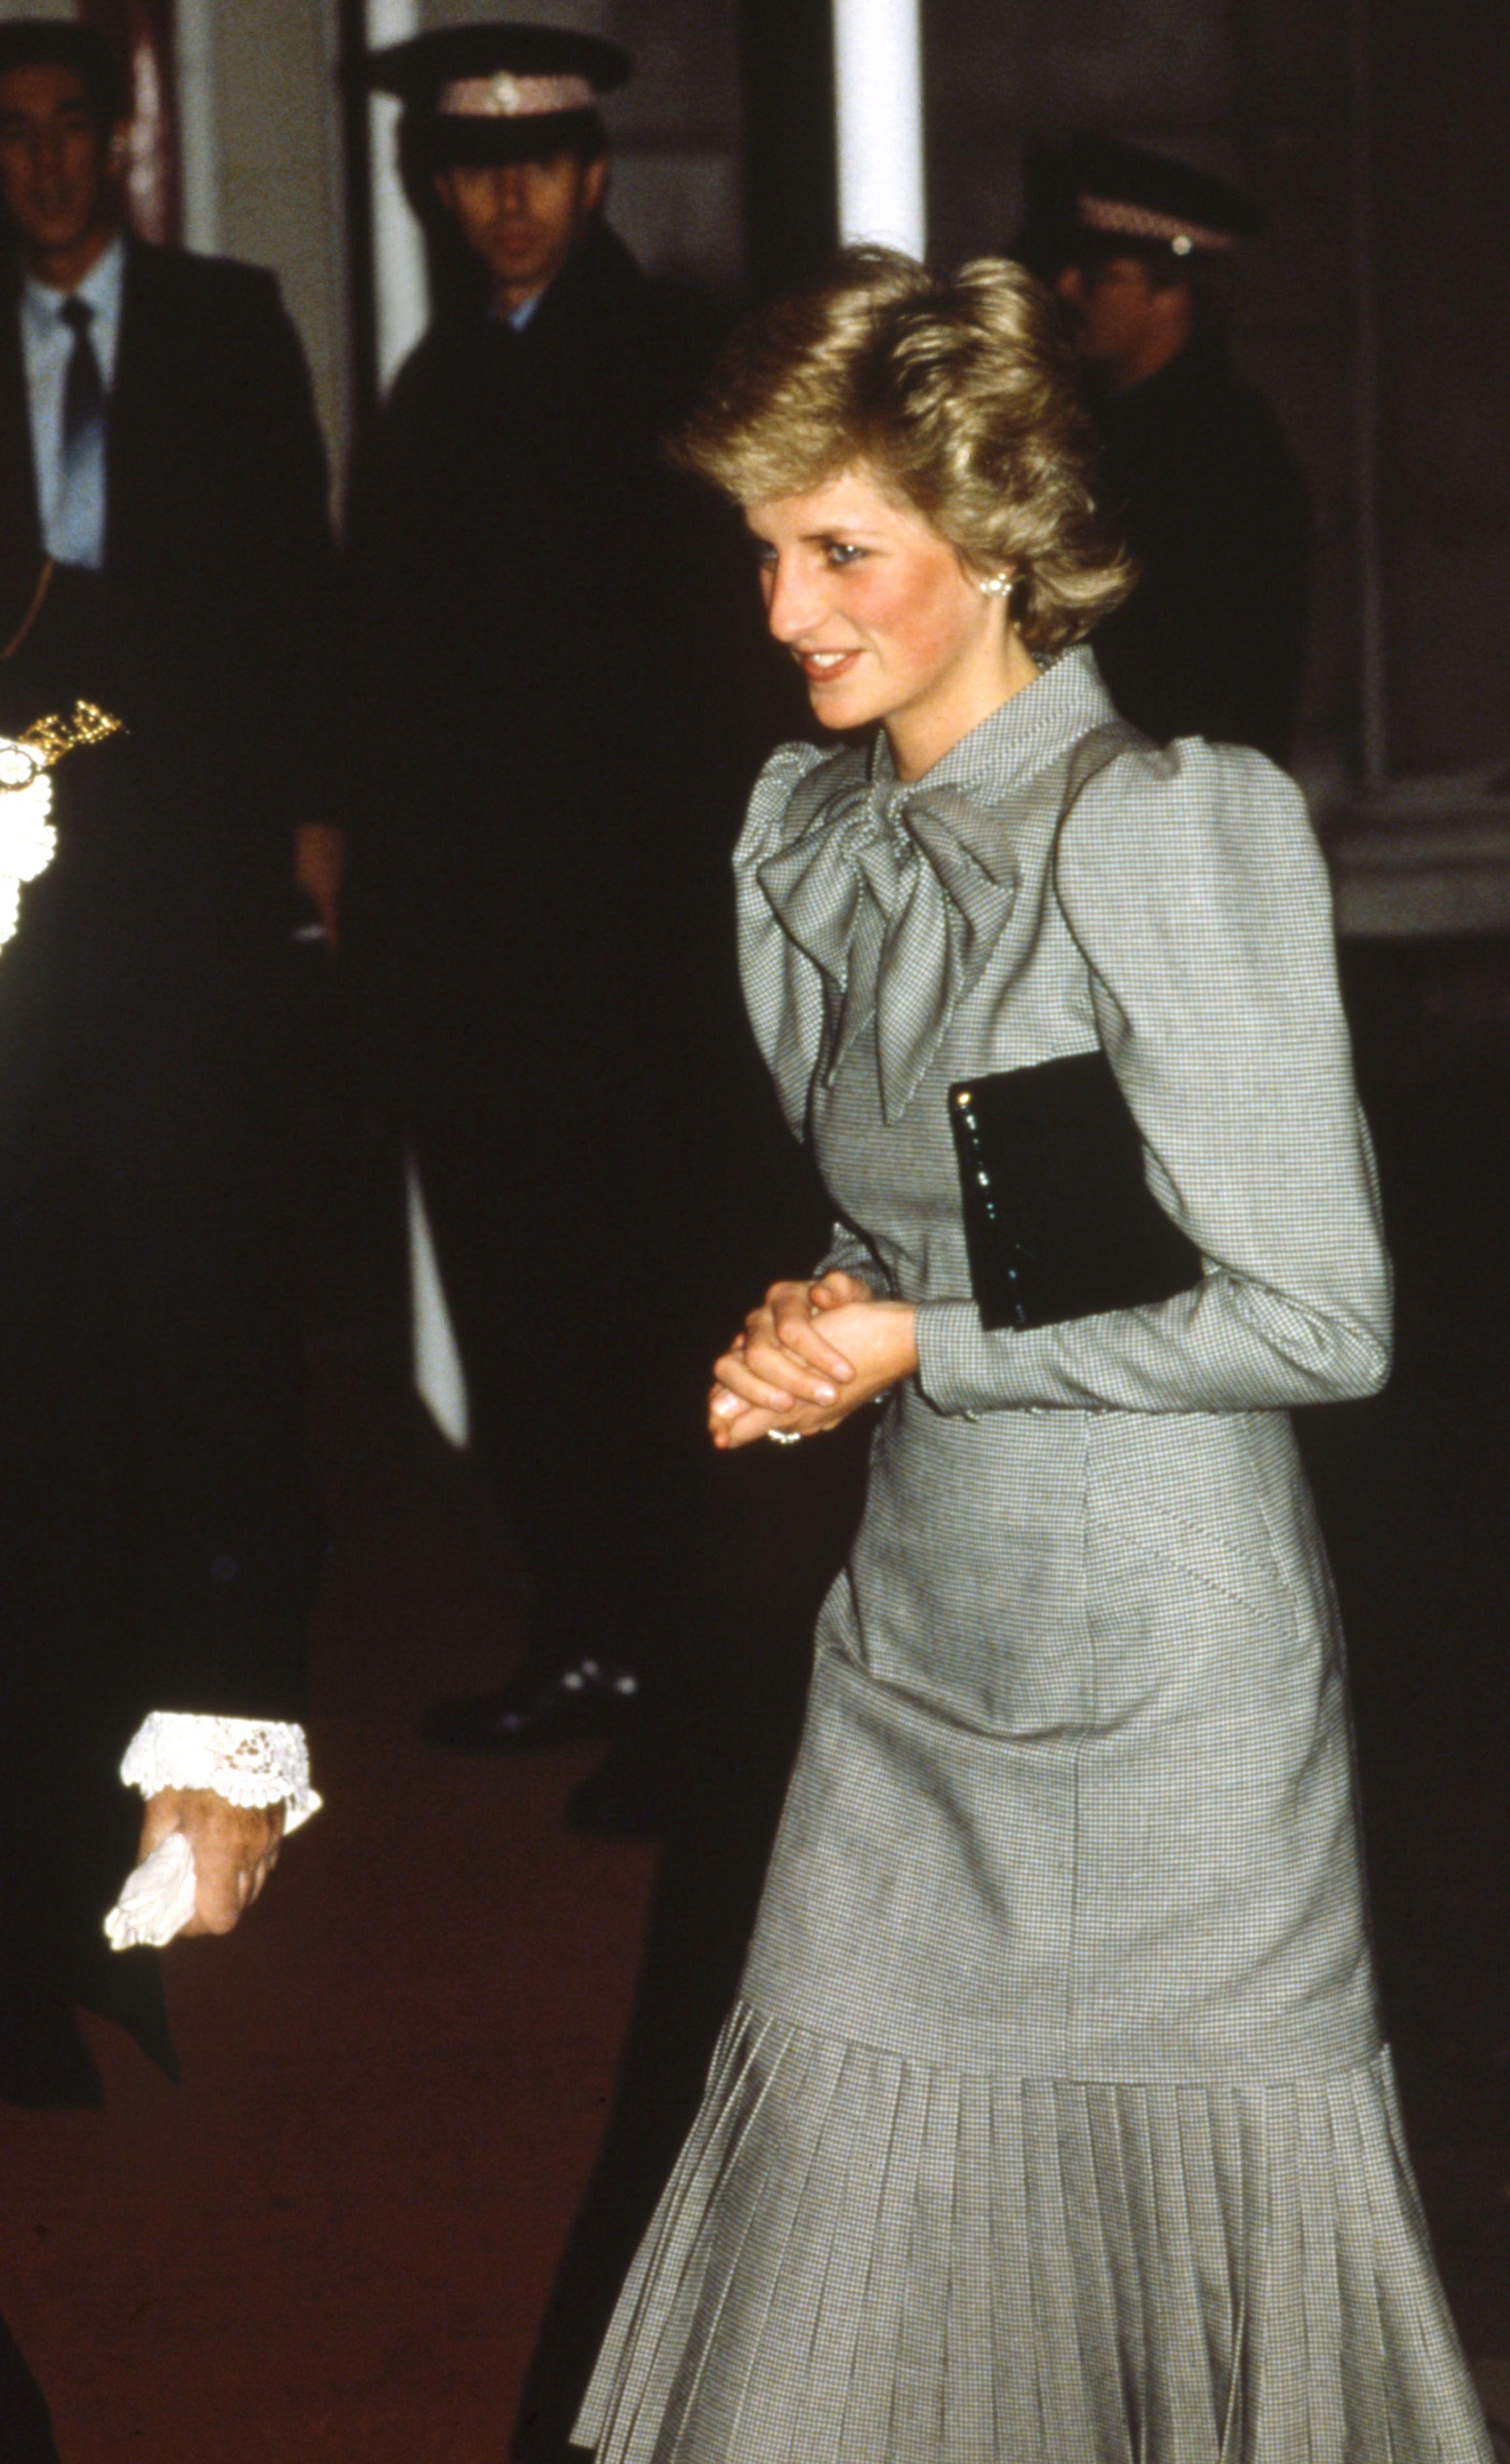 50 Shades Of Grey Dresses Princess Diana In A Grey Dress Princess Diana Fashion Princess Diana Dresses Diana [ 3781 x 2317 Pixel ]